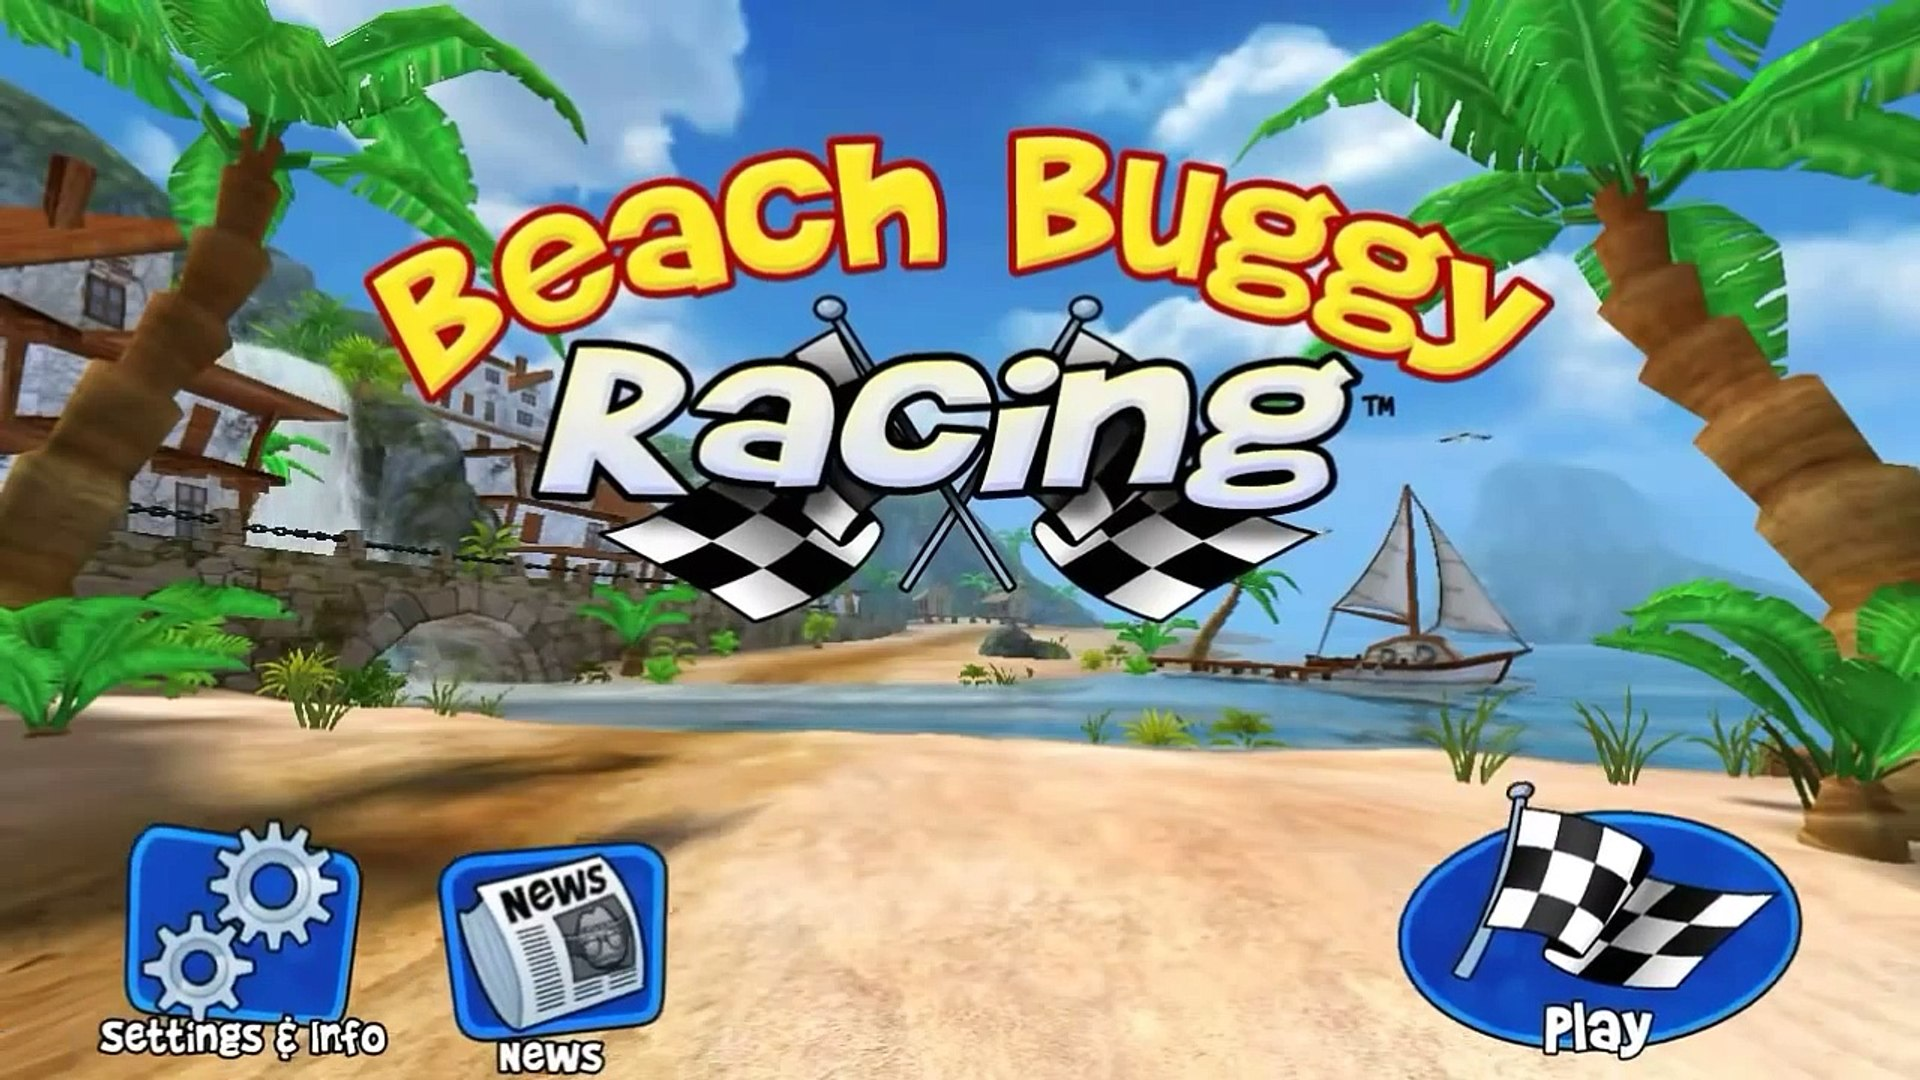 Hack Beach Buggy Racing Cheat